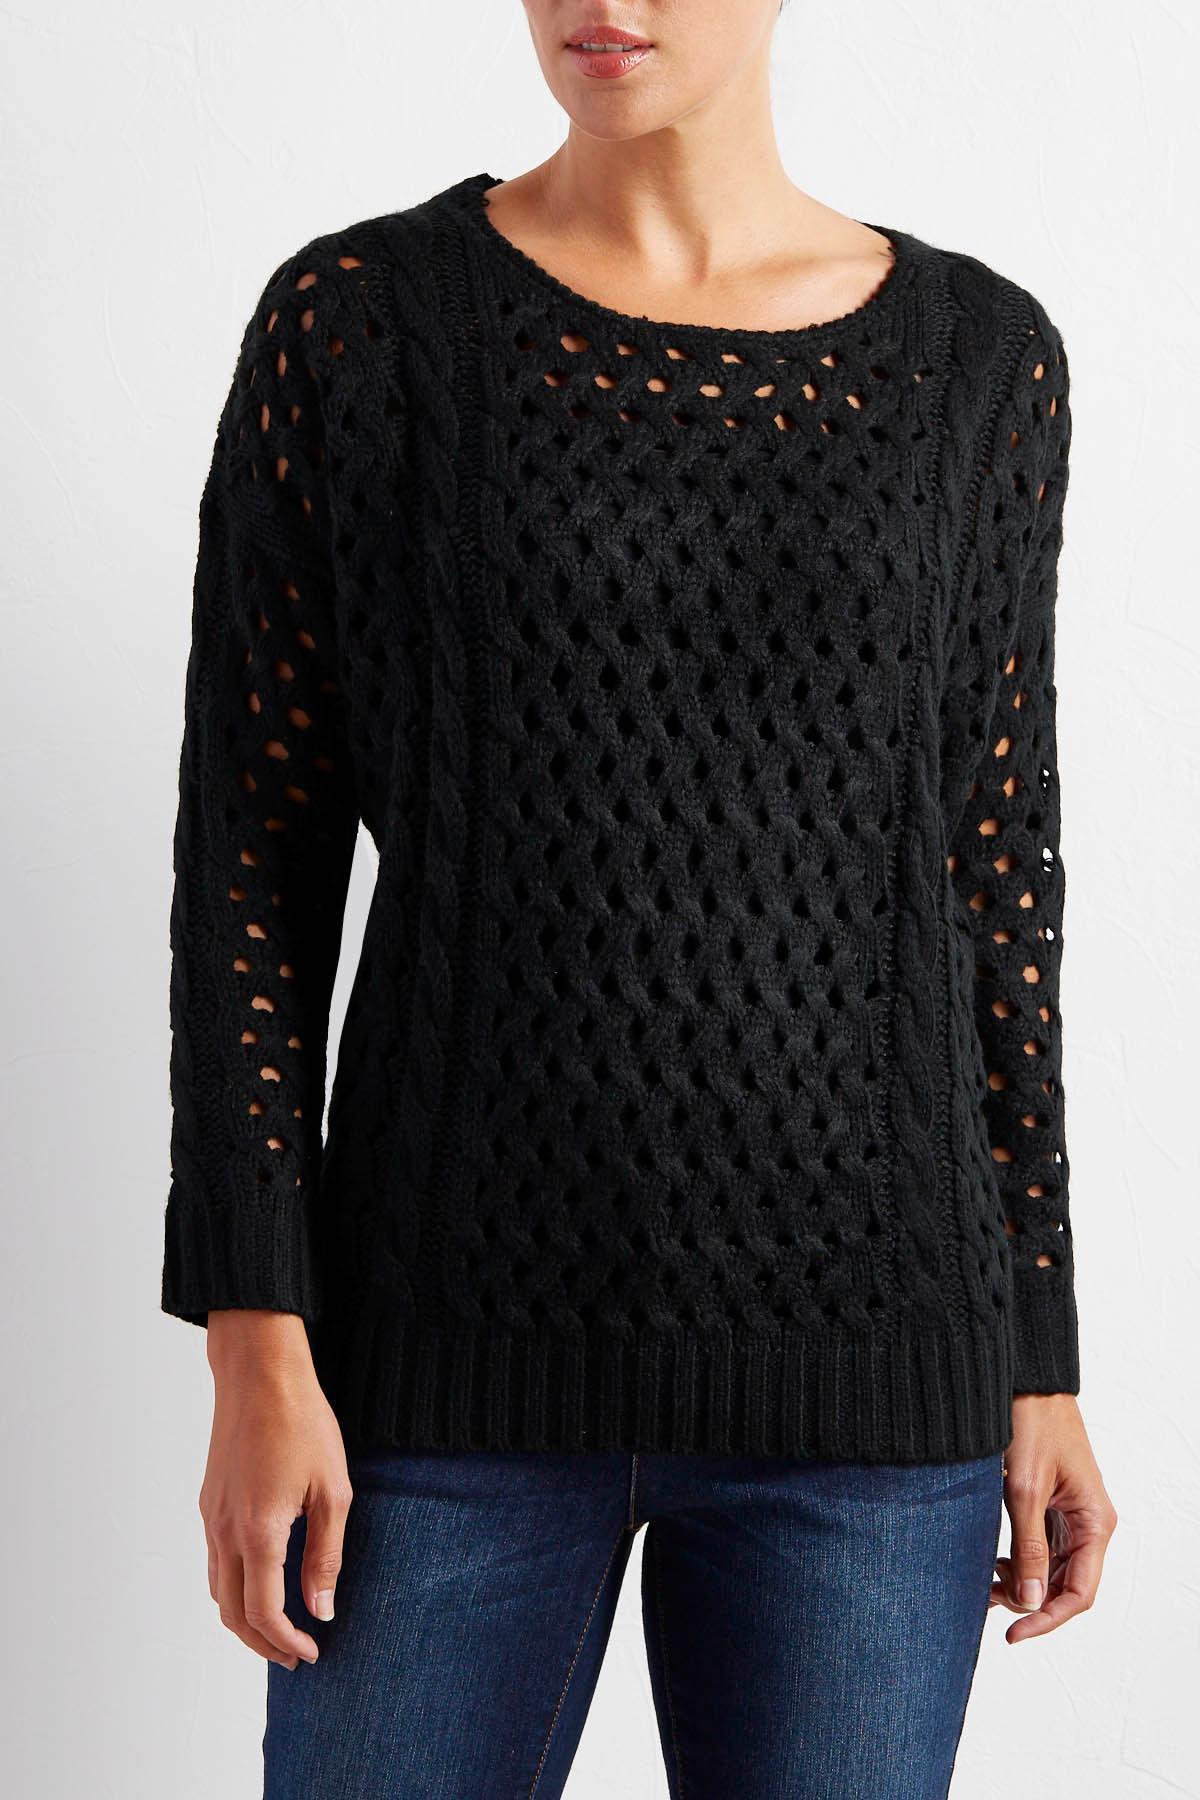 Fishnet Knit Sweater